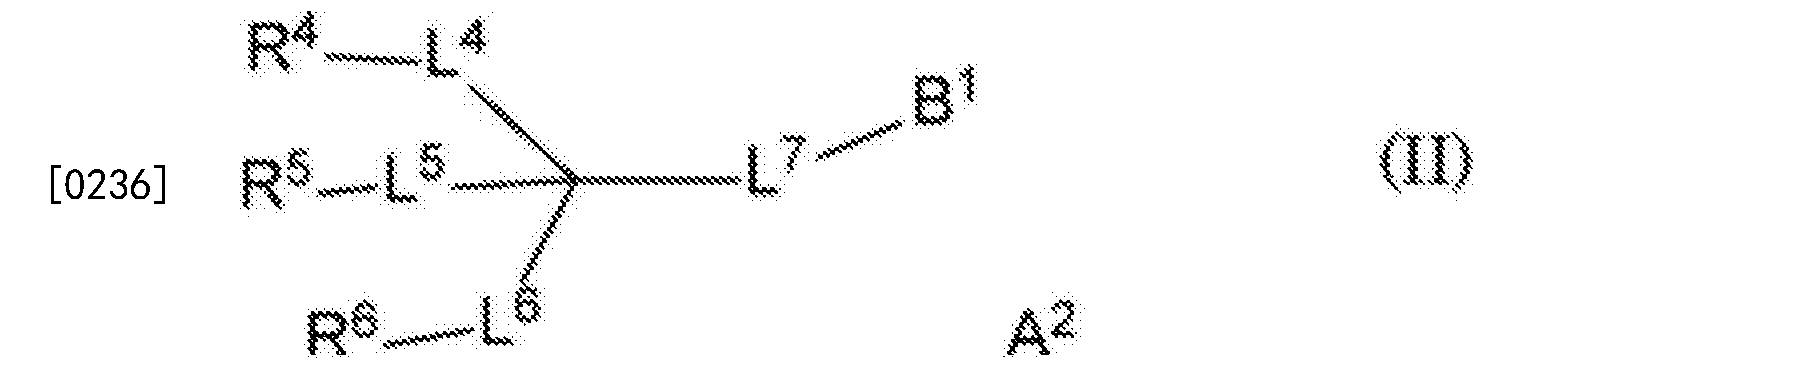 Figure CN107427531AD00542